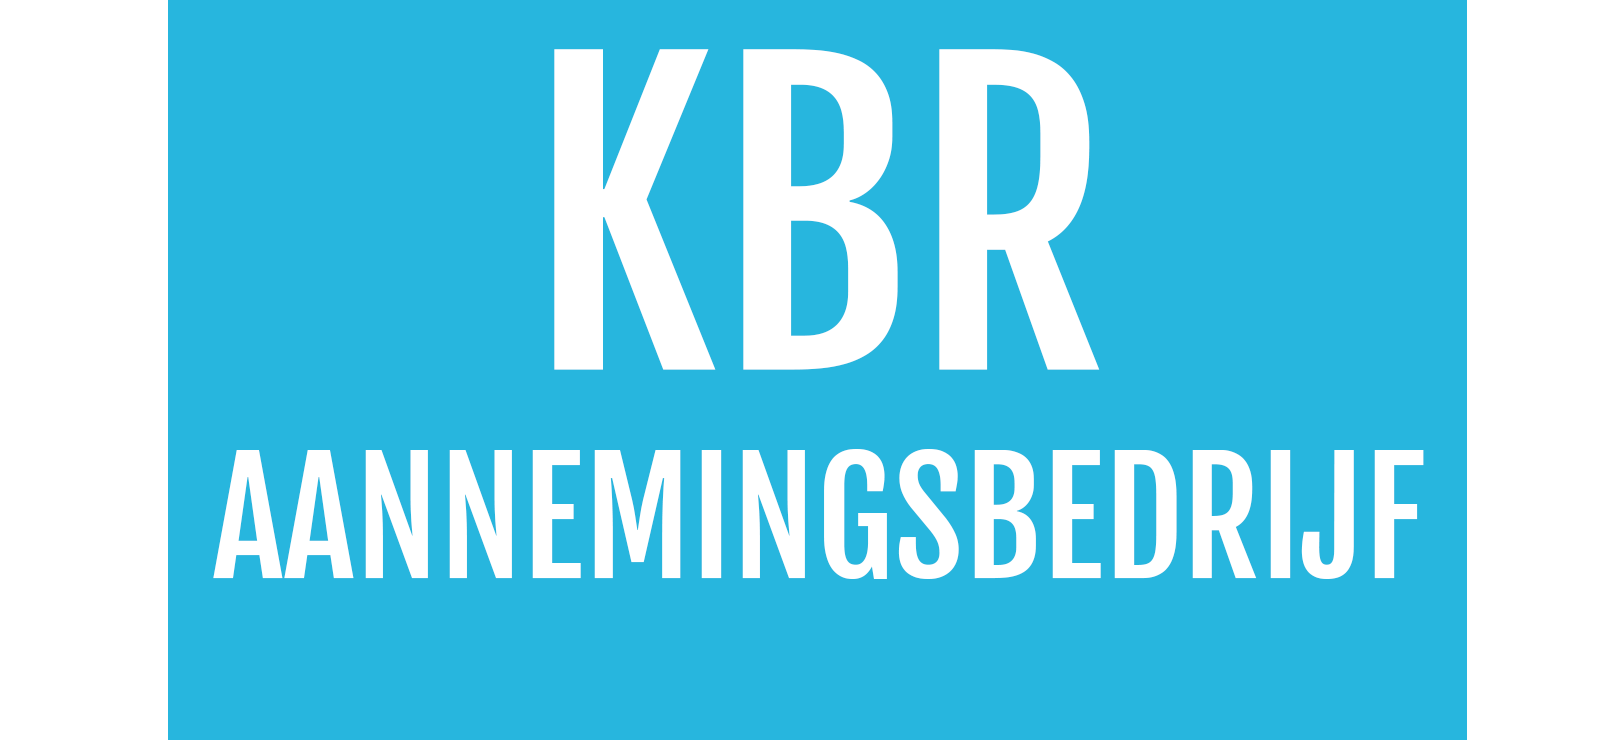 KBR aannemingsbedrijf